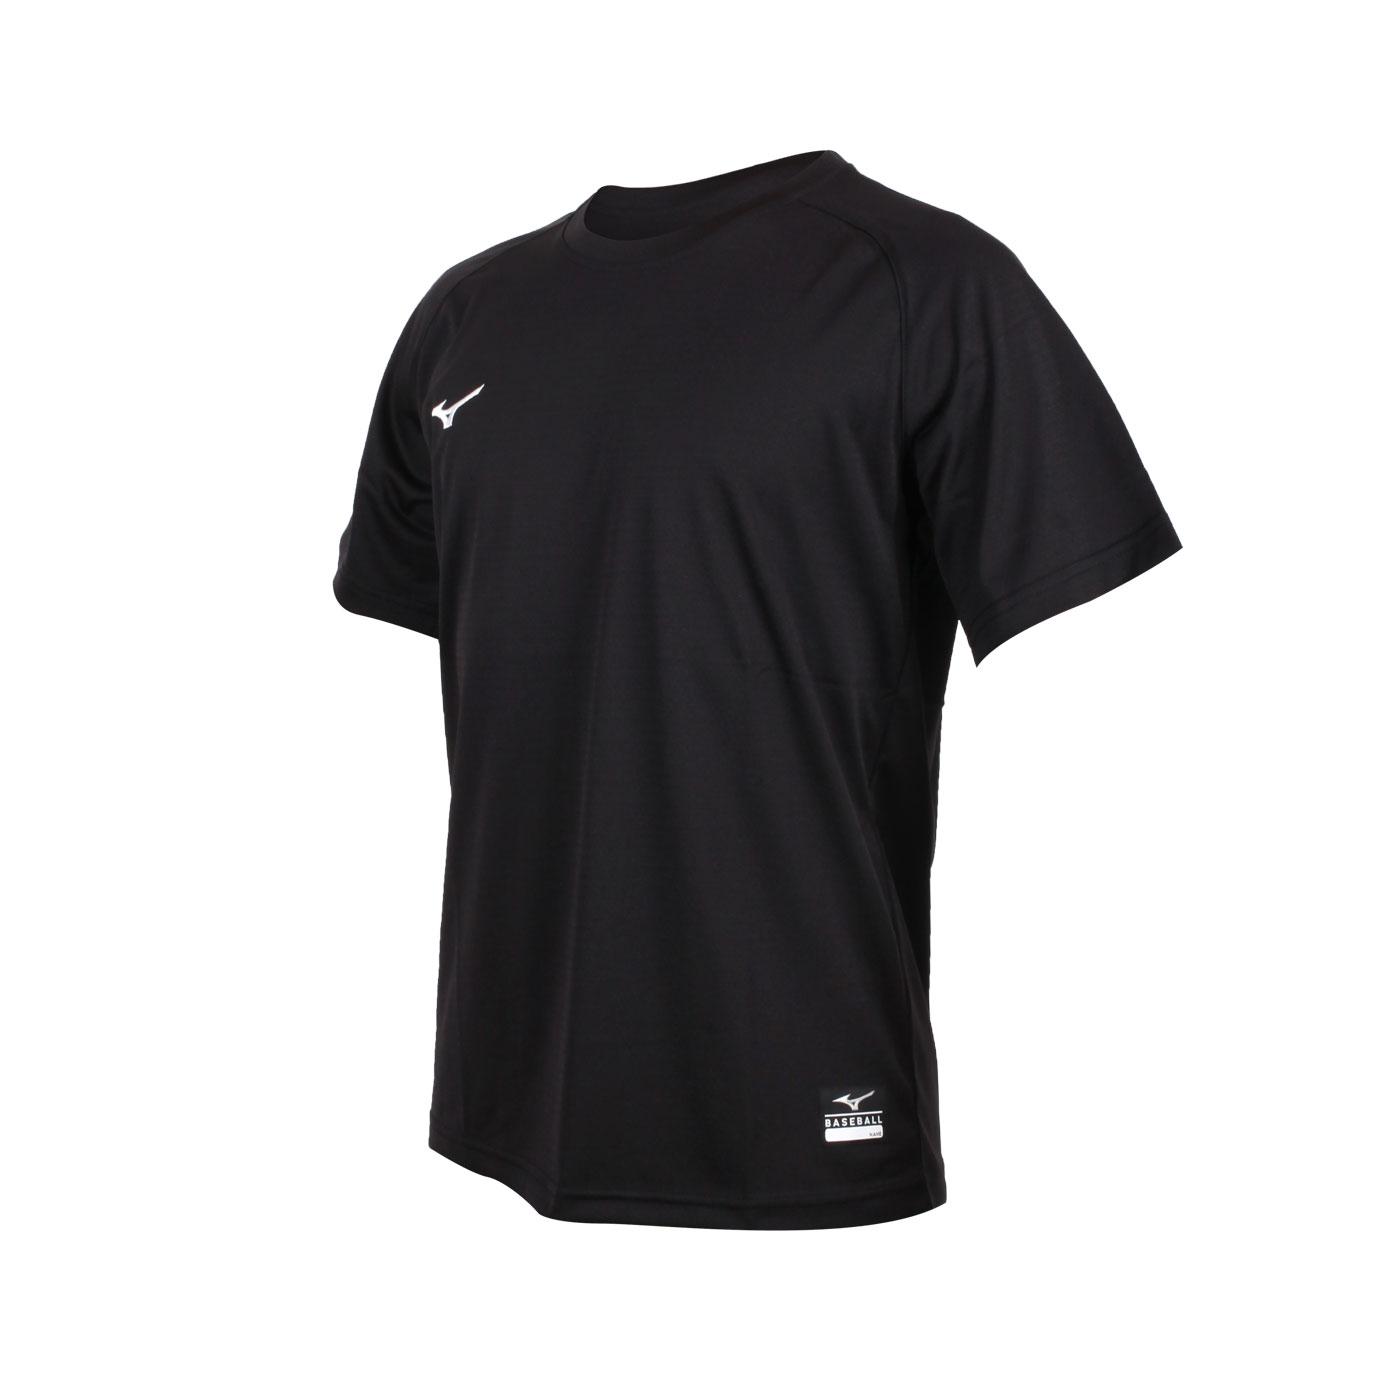 MIZUNO 男款棒球練習短袖T恤 12TC0L1109 - 黑白